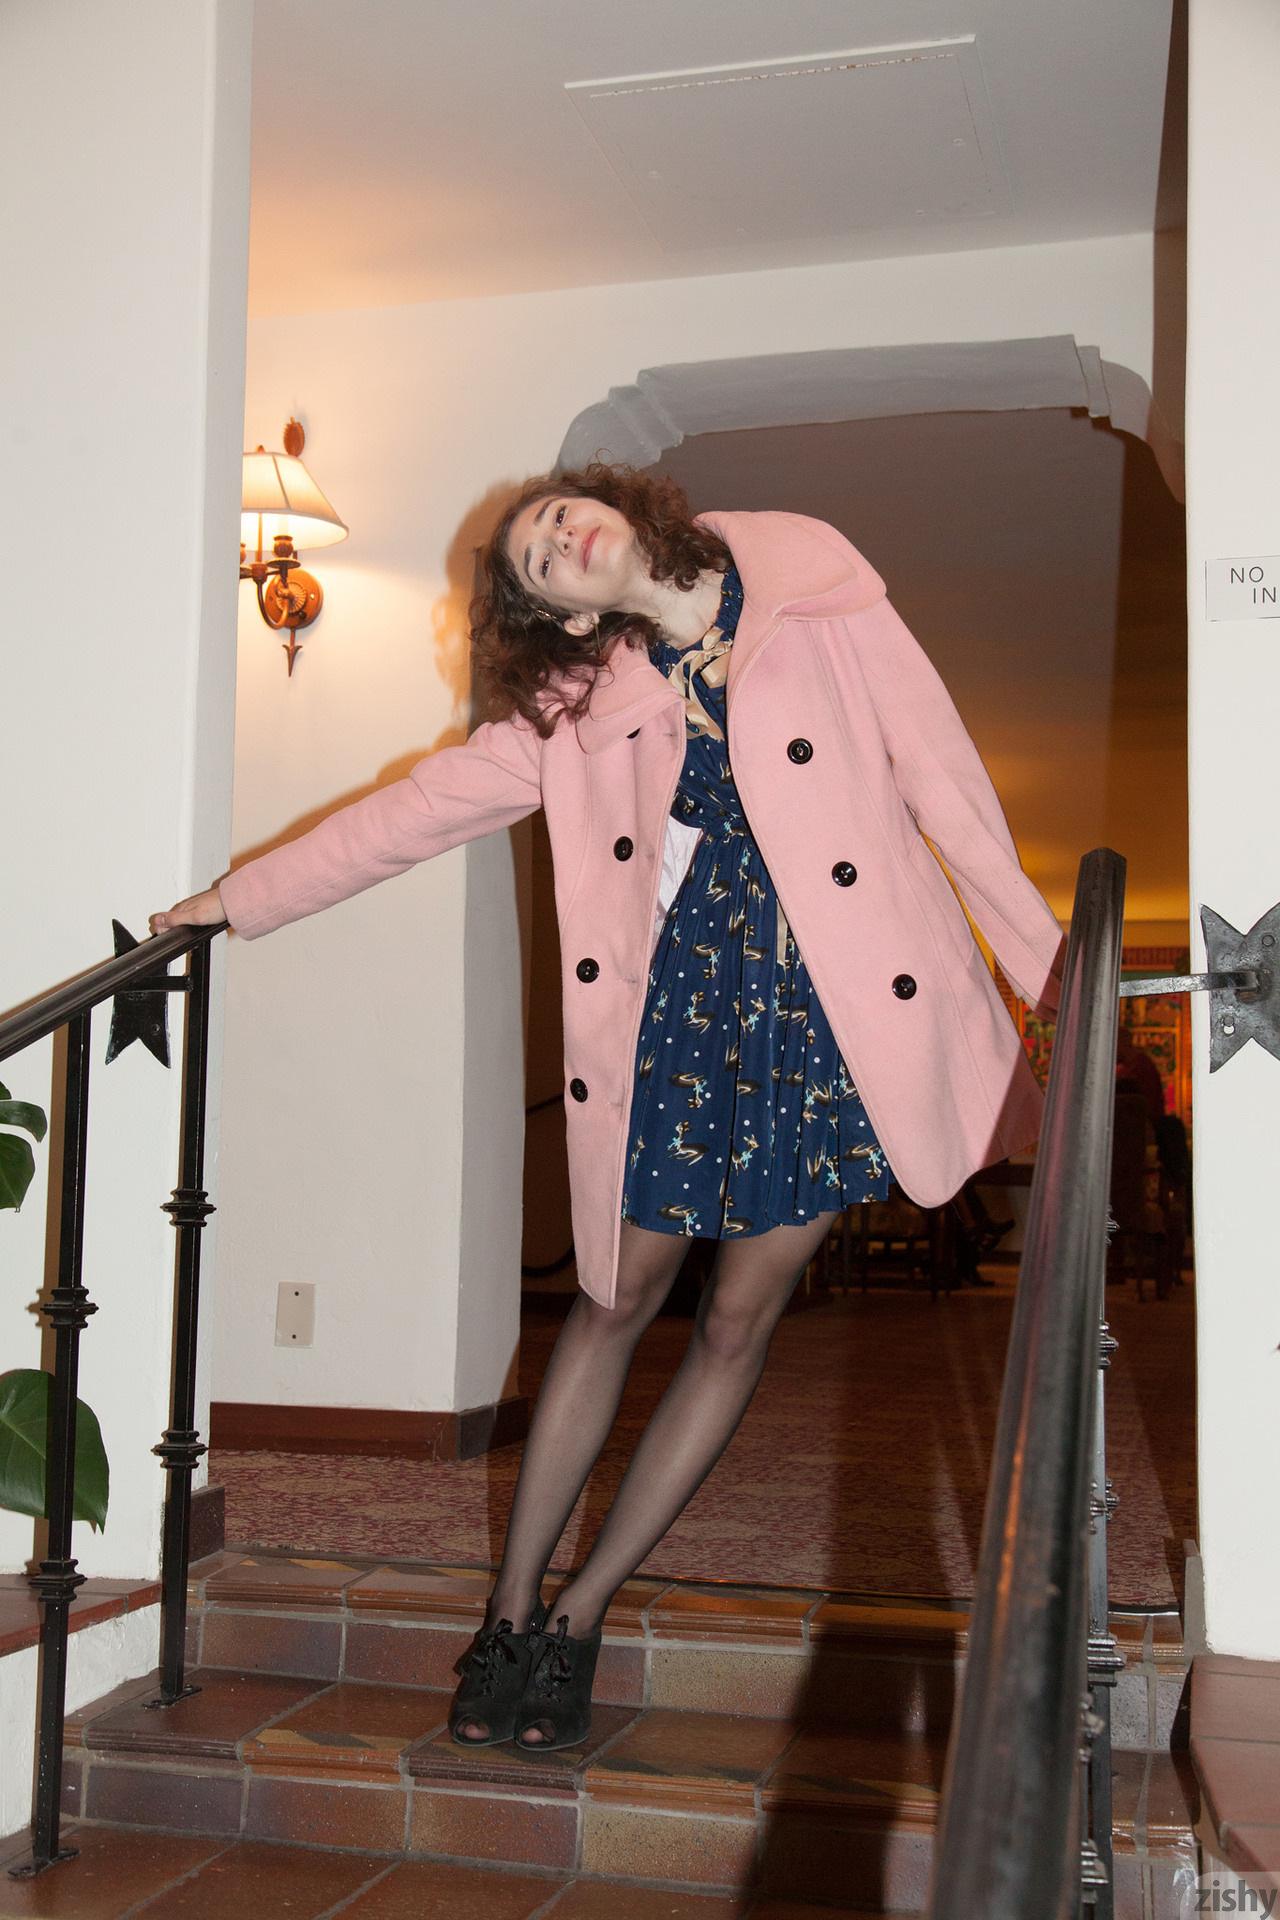 Yvette Nolot At Arizona Inn Zishy (34)